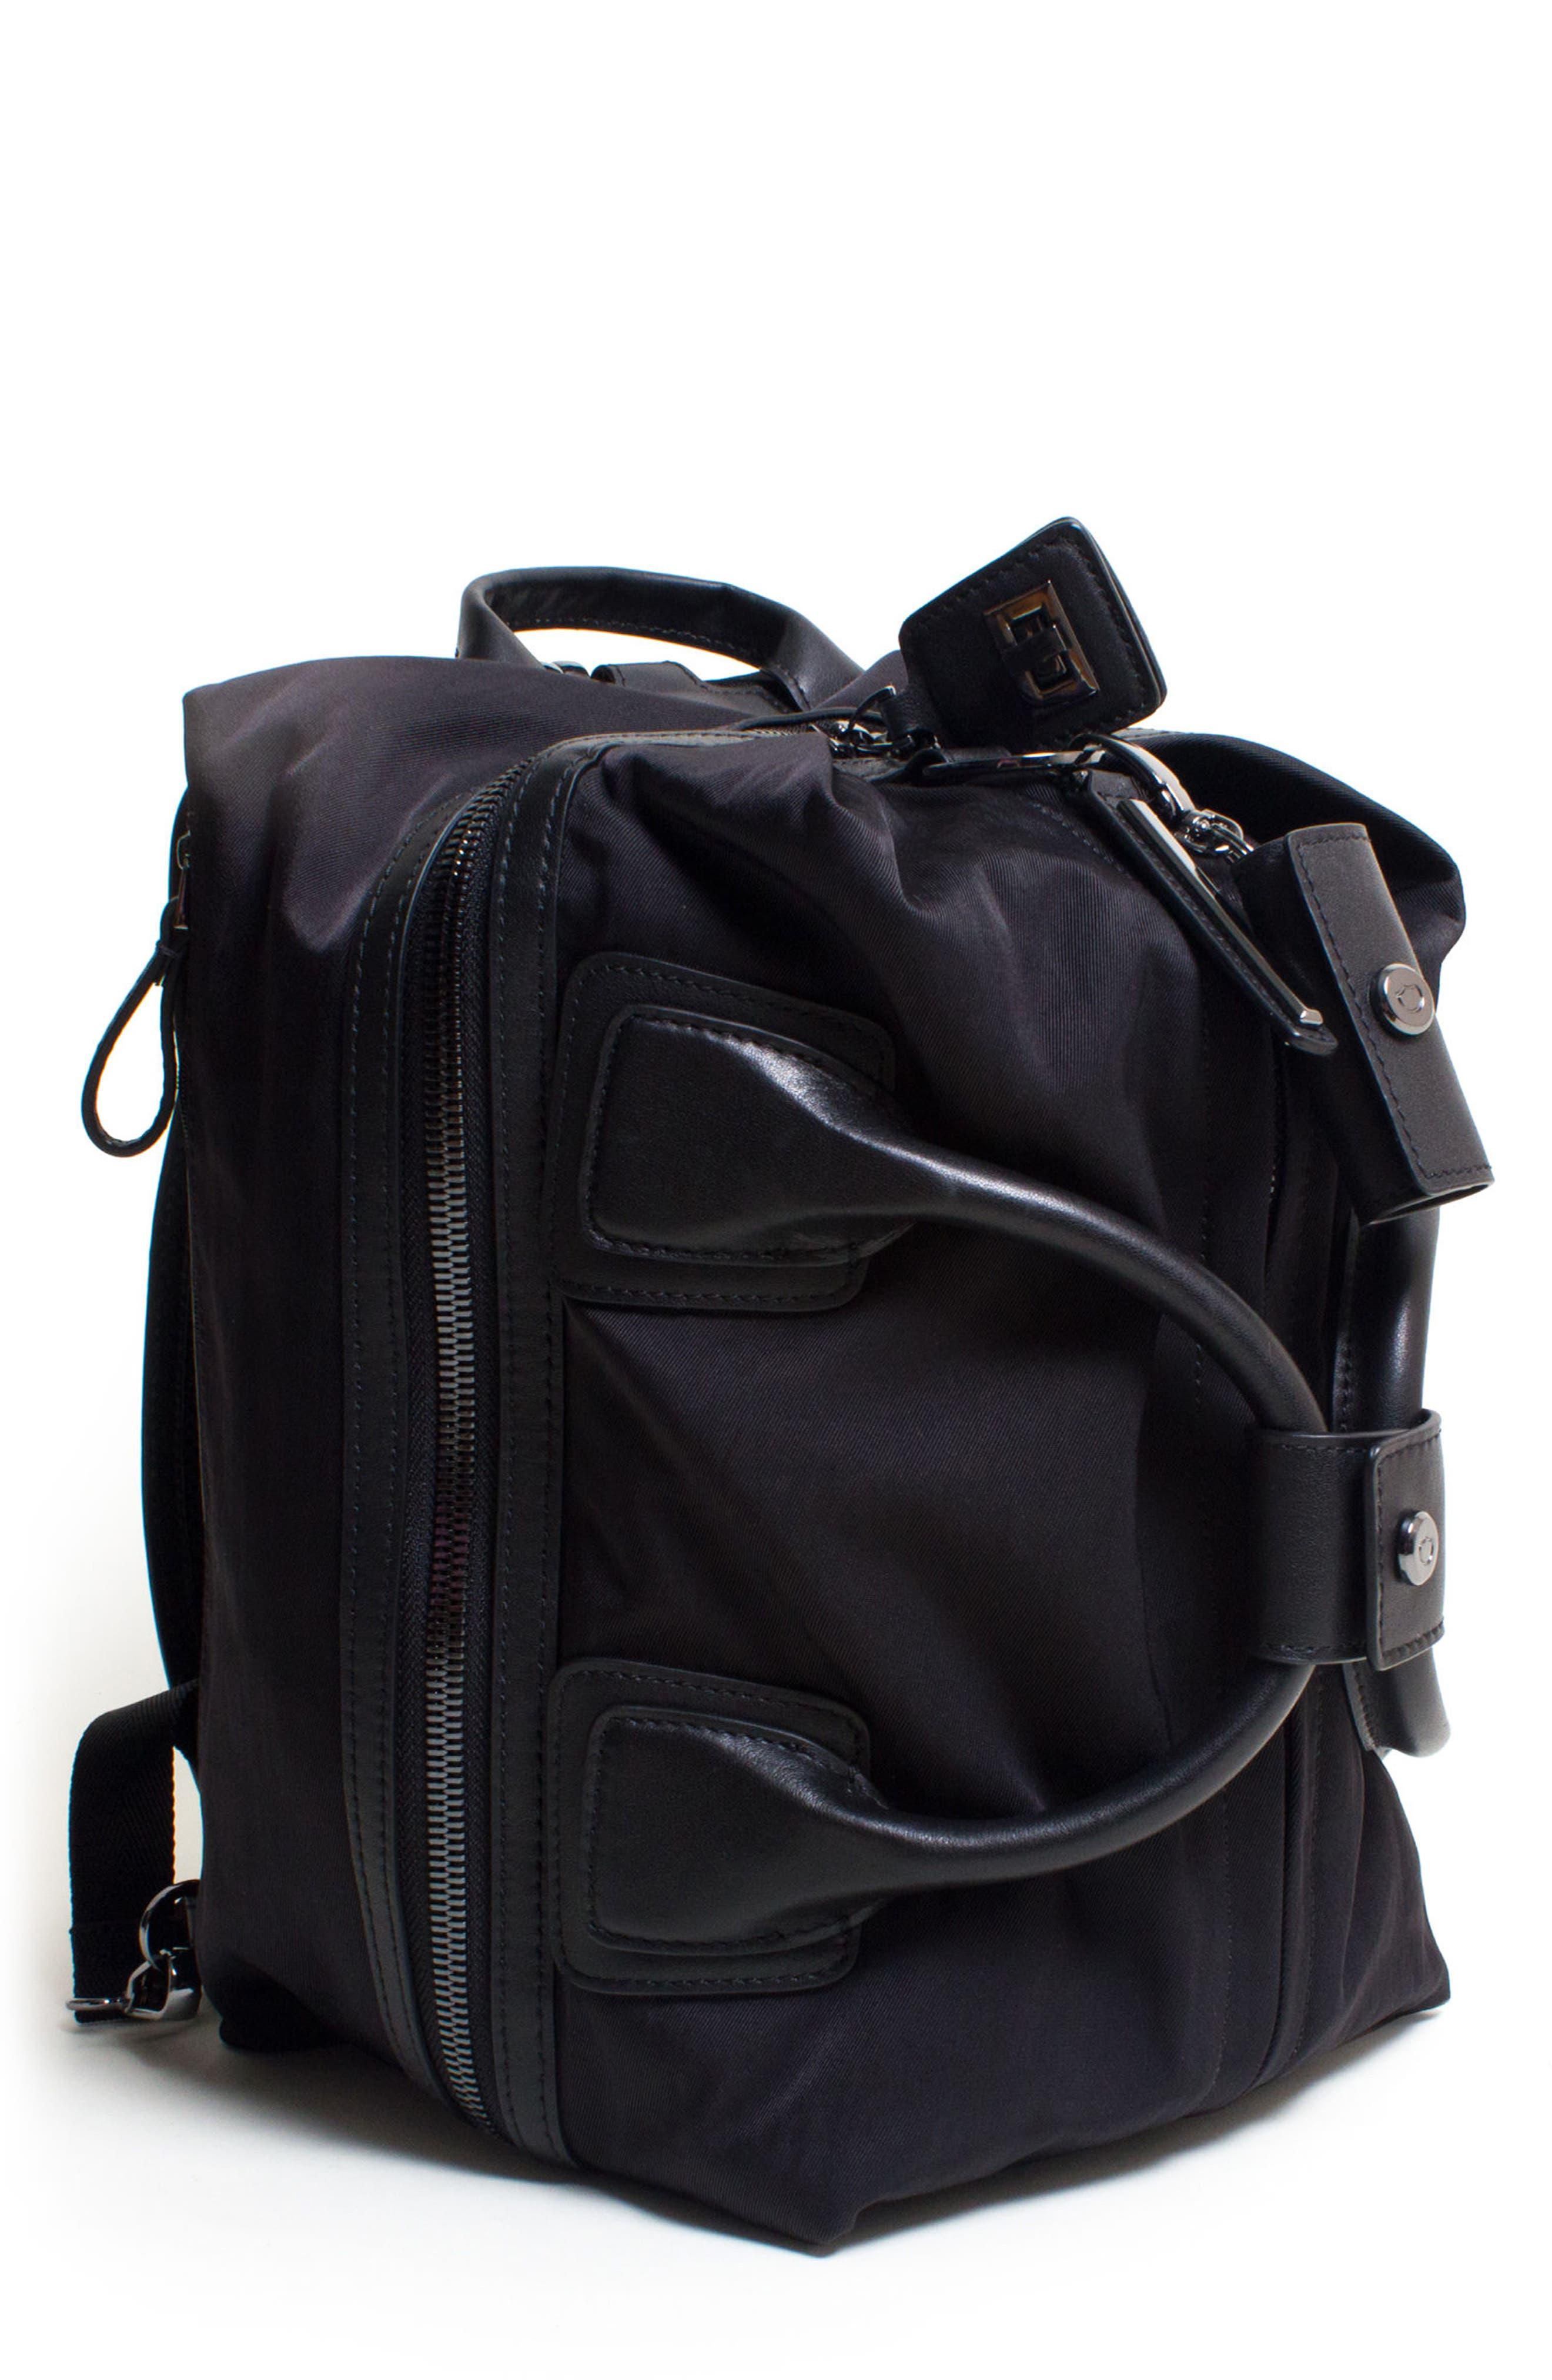 Main Image - Caraa Studio Duffel Backpack